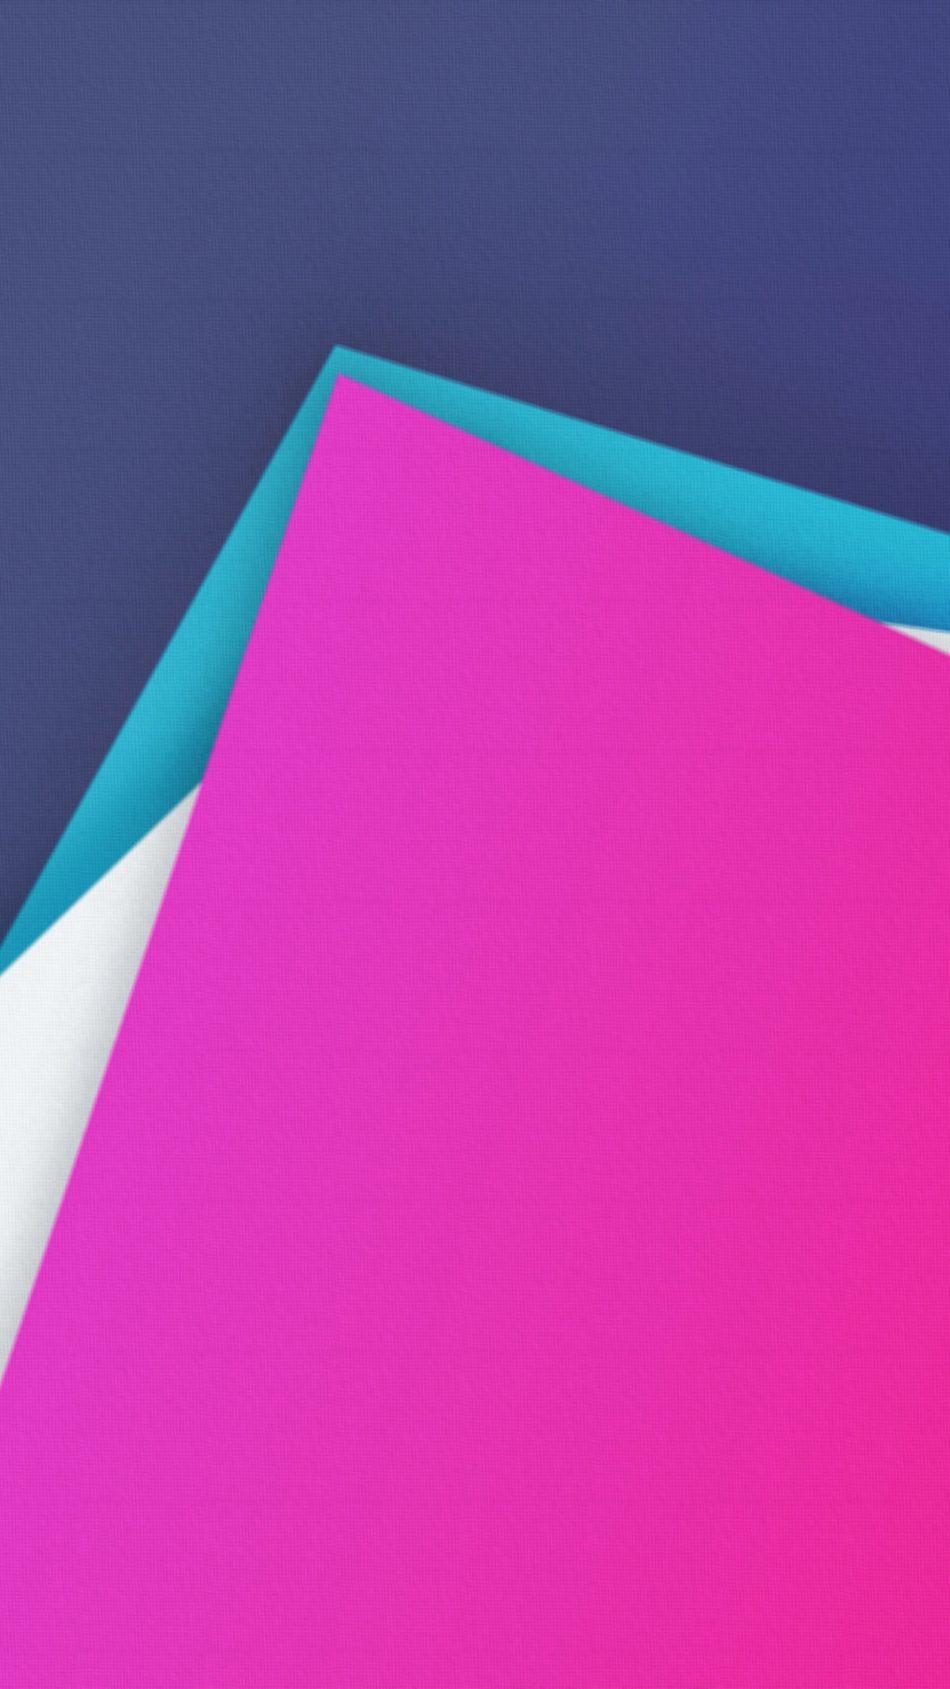 Download Geometric Colorful Design Free Pure 4k Ultra Hd